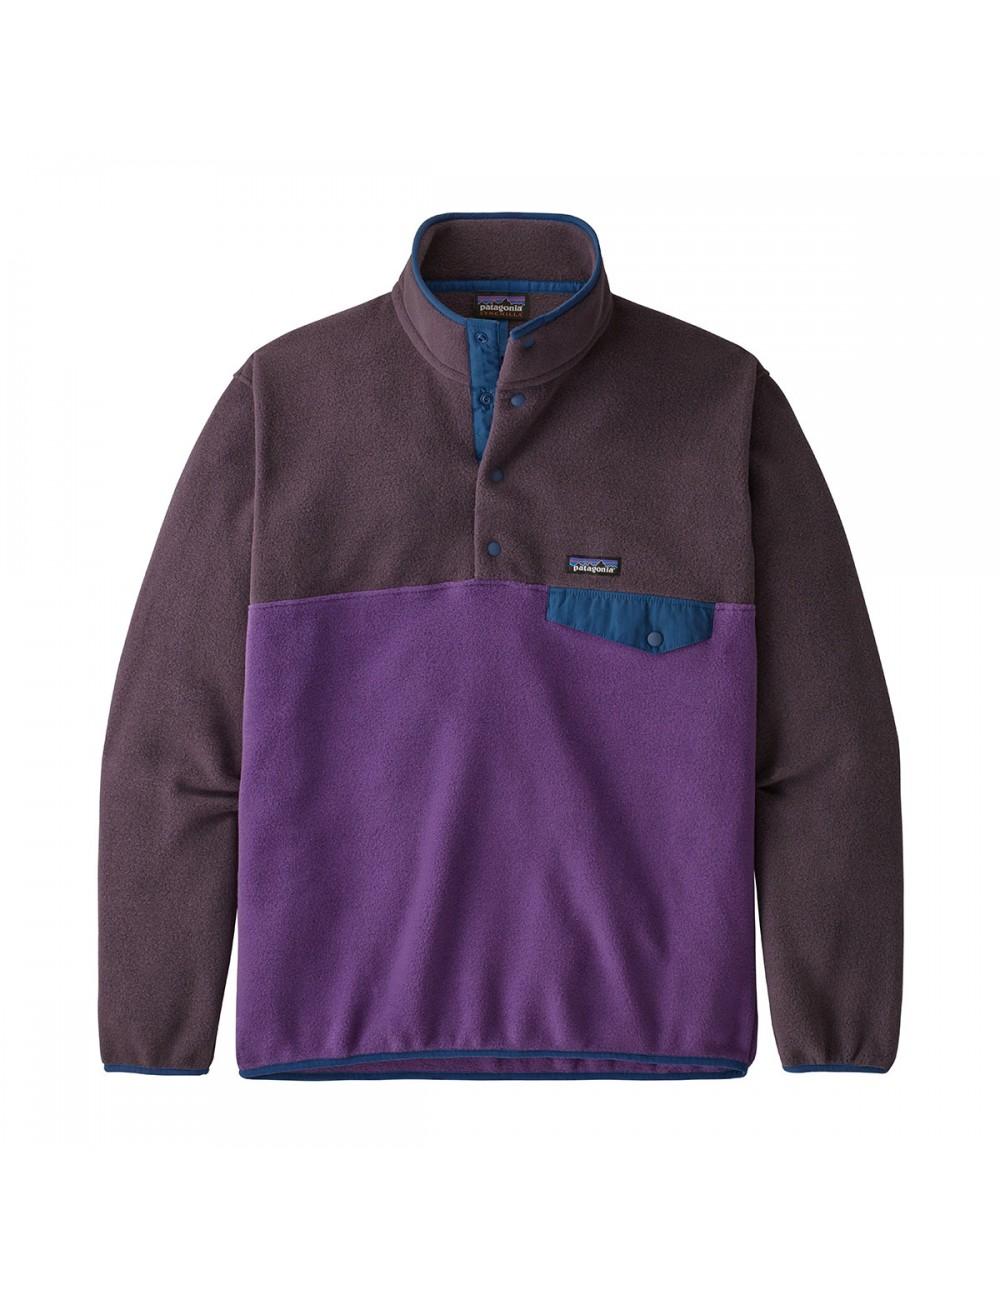 Patagonia Lightweight Synchilla Snap-T Fleece Pullover - Purple_13297